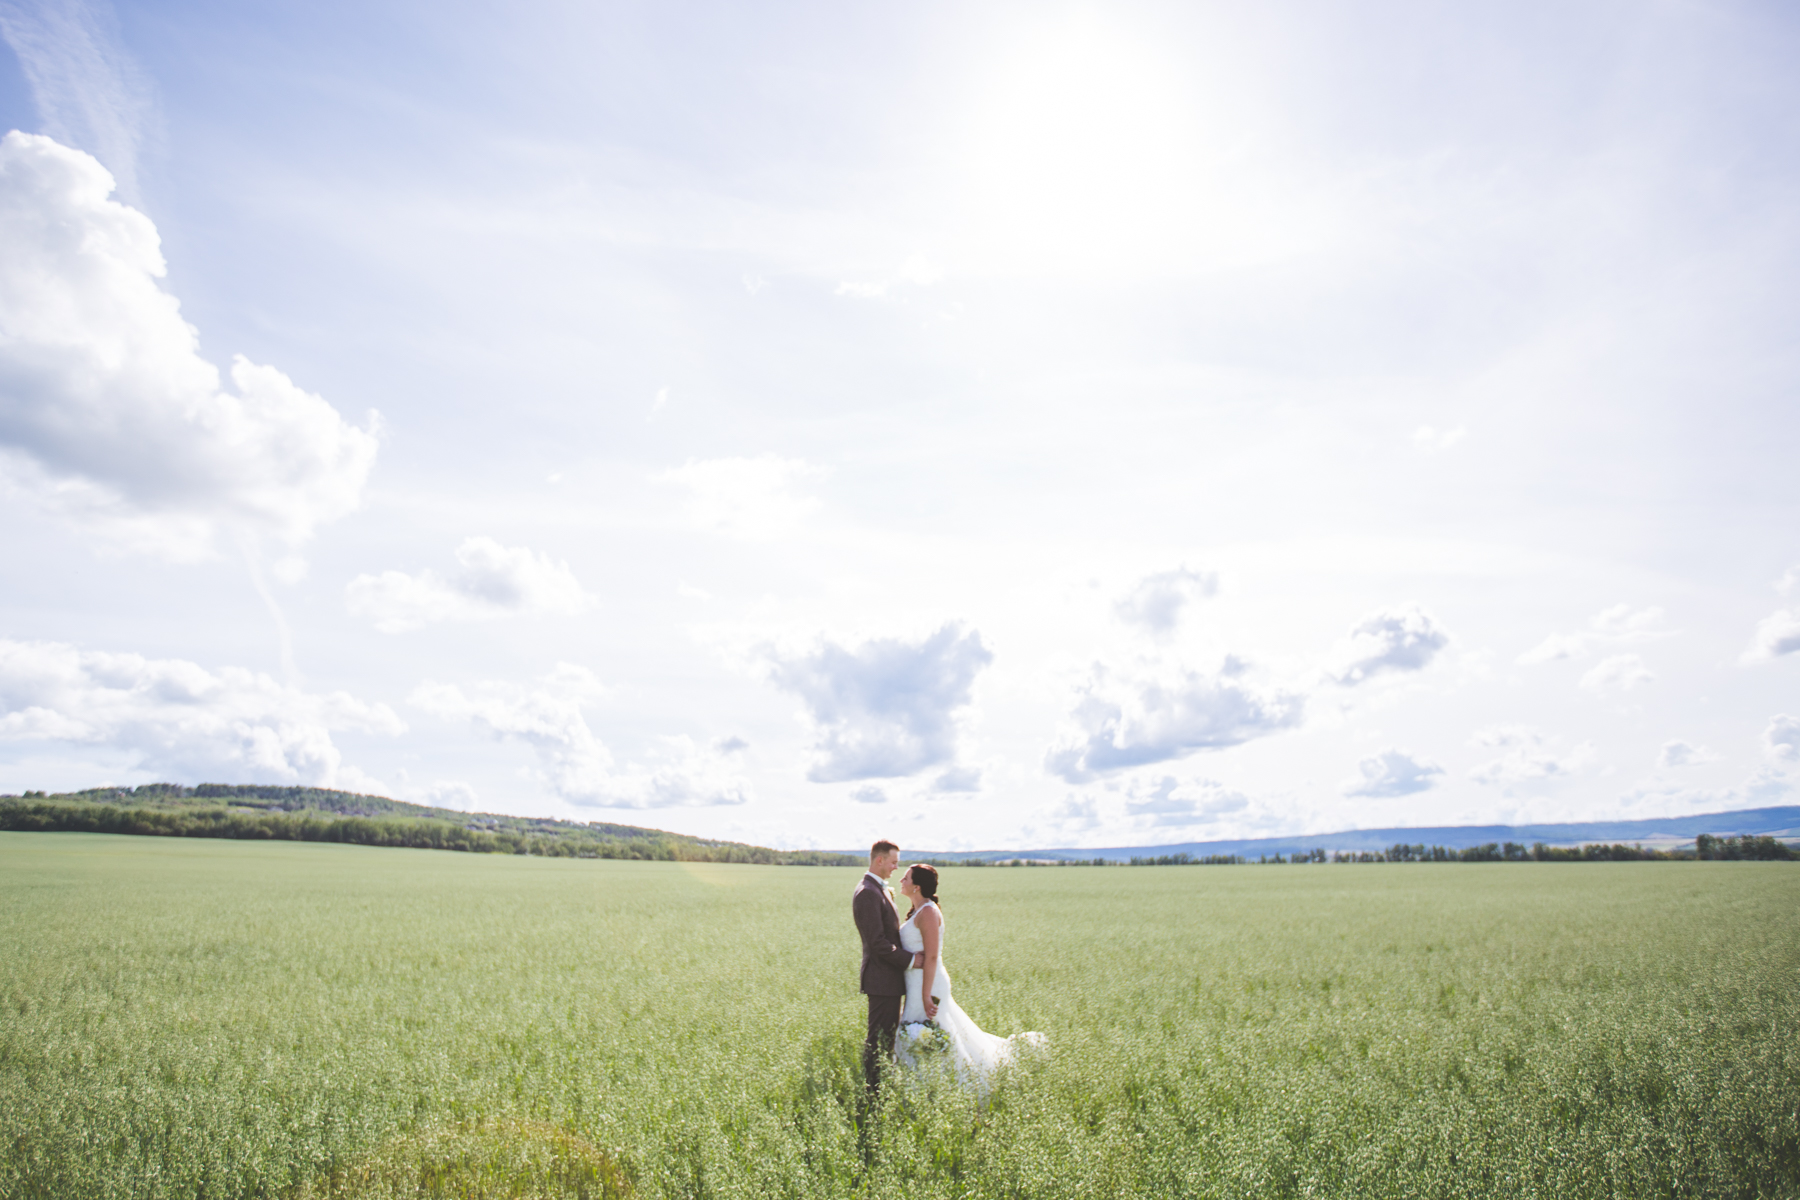 20150808-oglovewedding-582.jpg